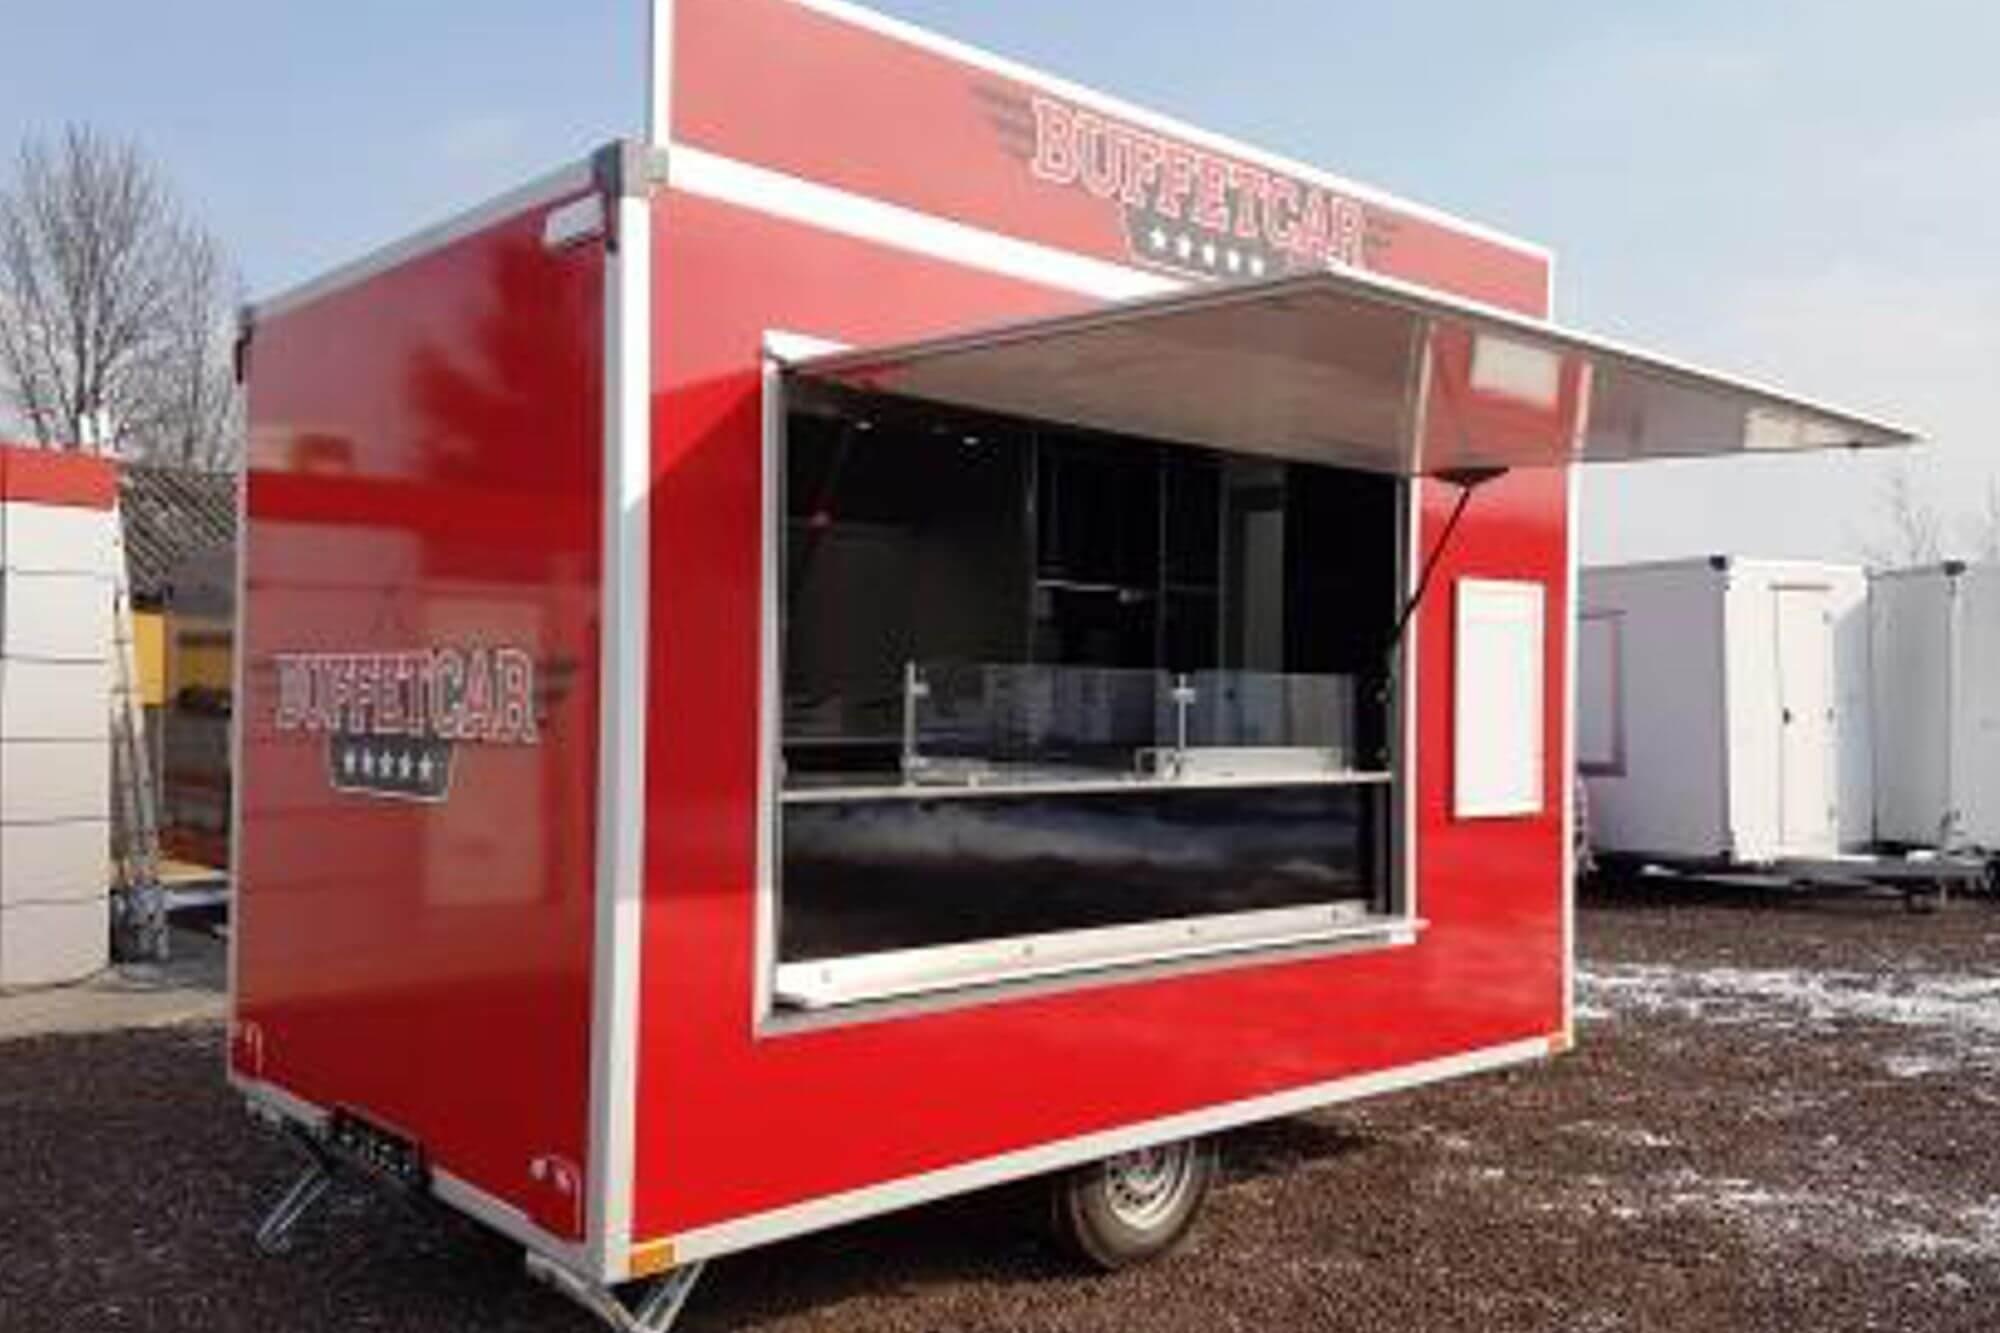 WaffelKRAM Belgische Waffeln Streetfood Foodtruck Catering